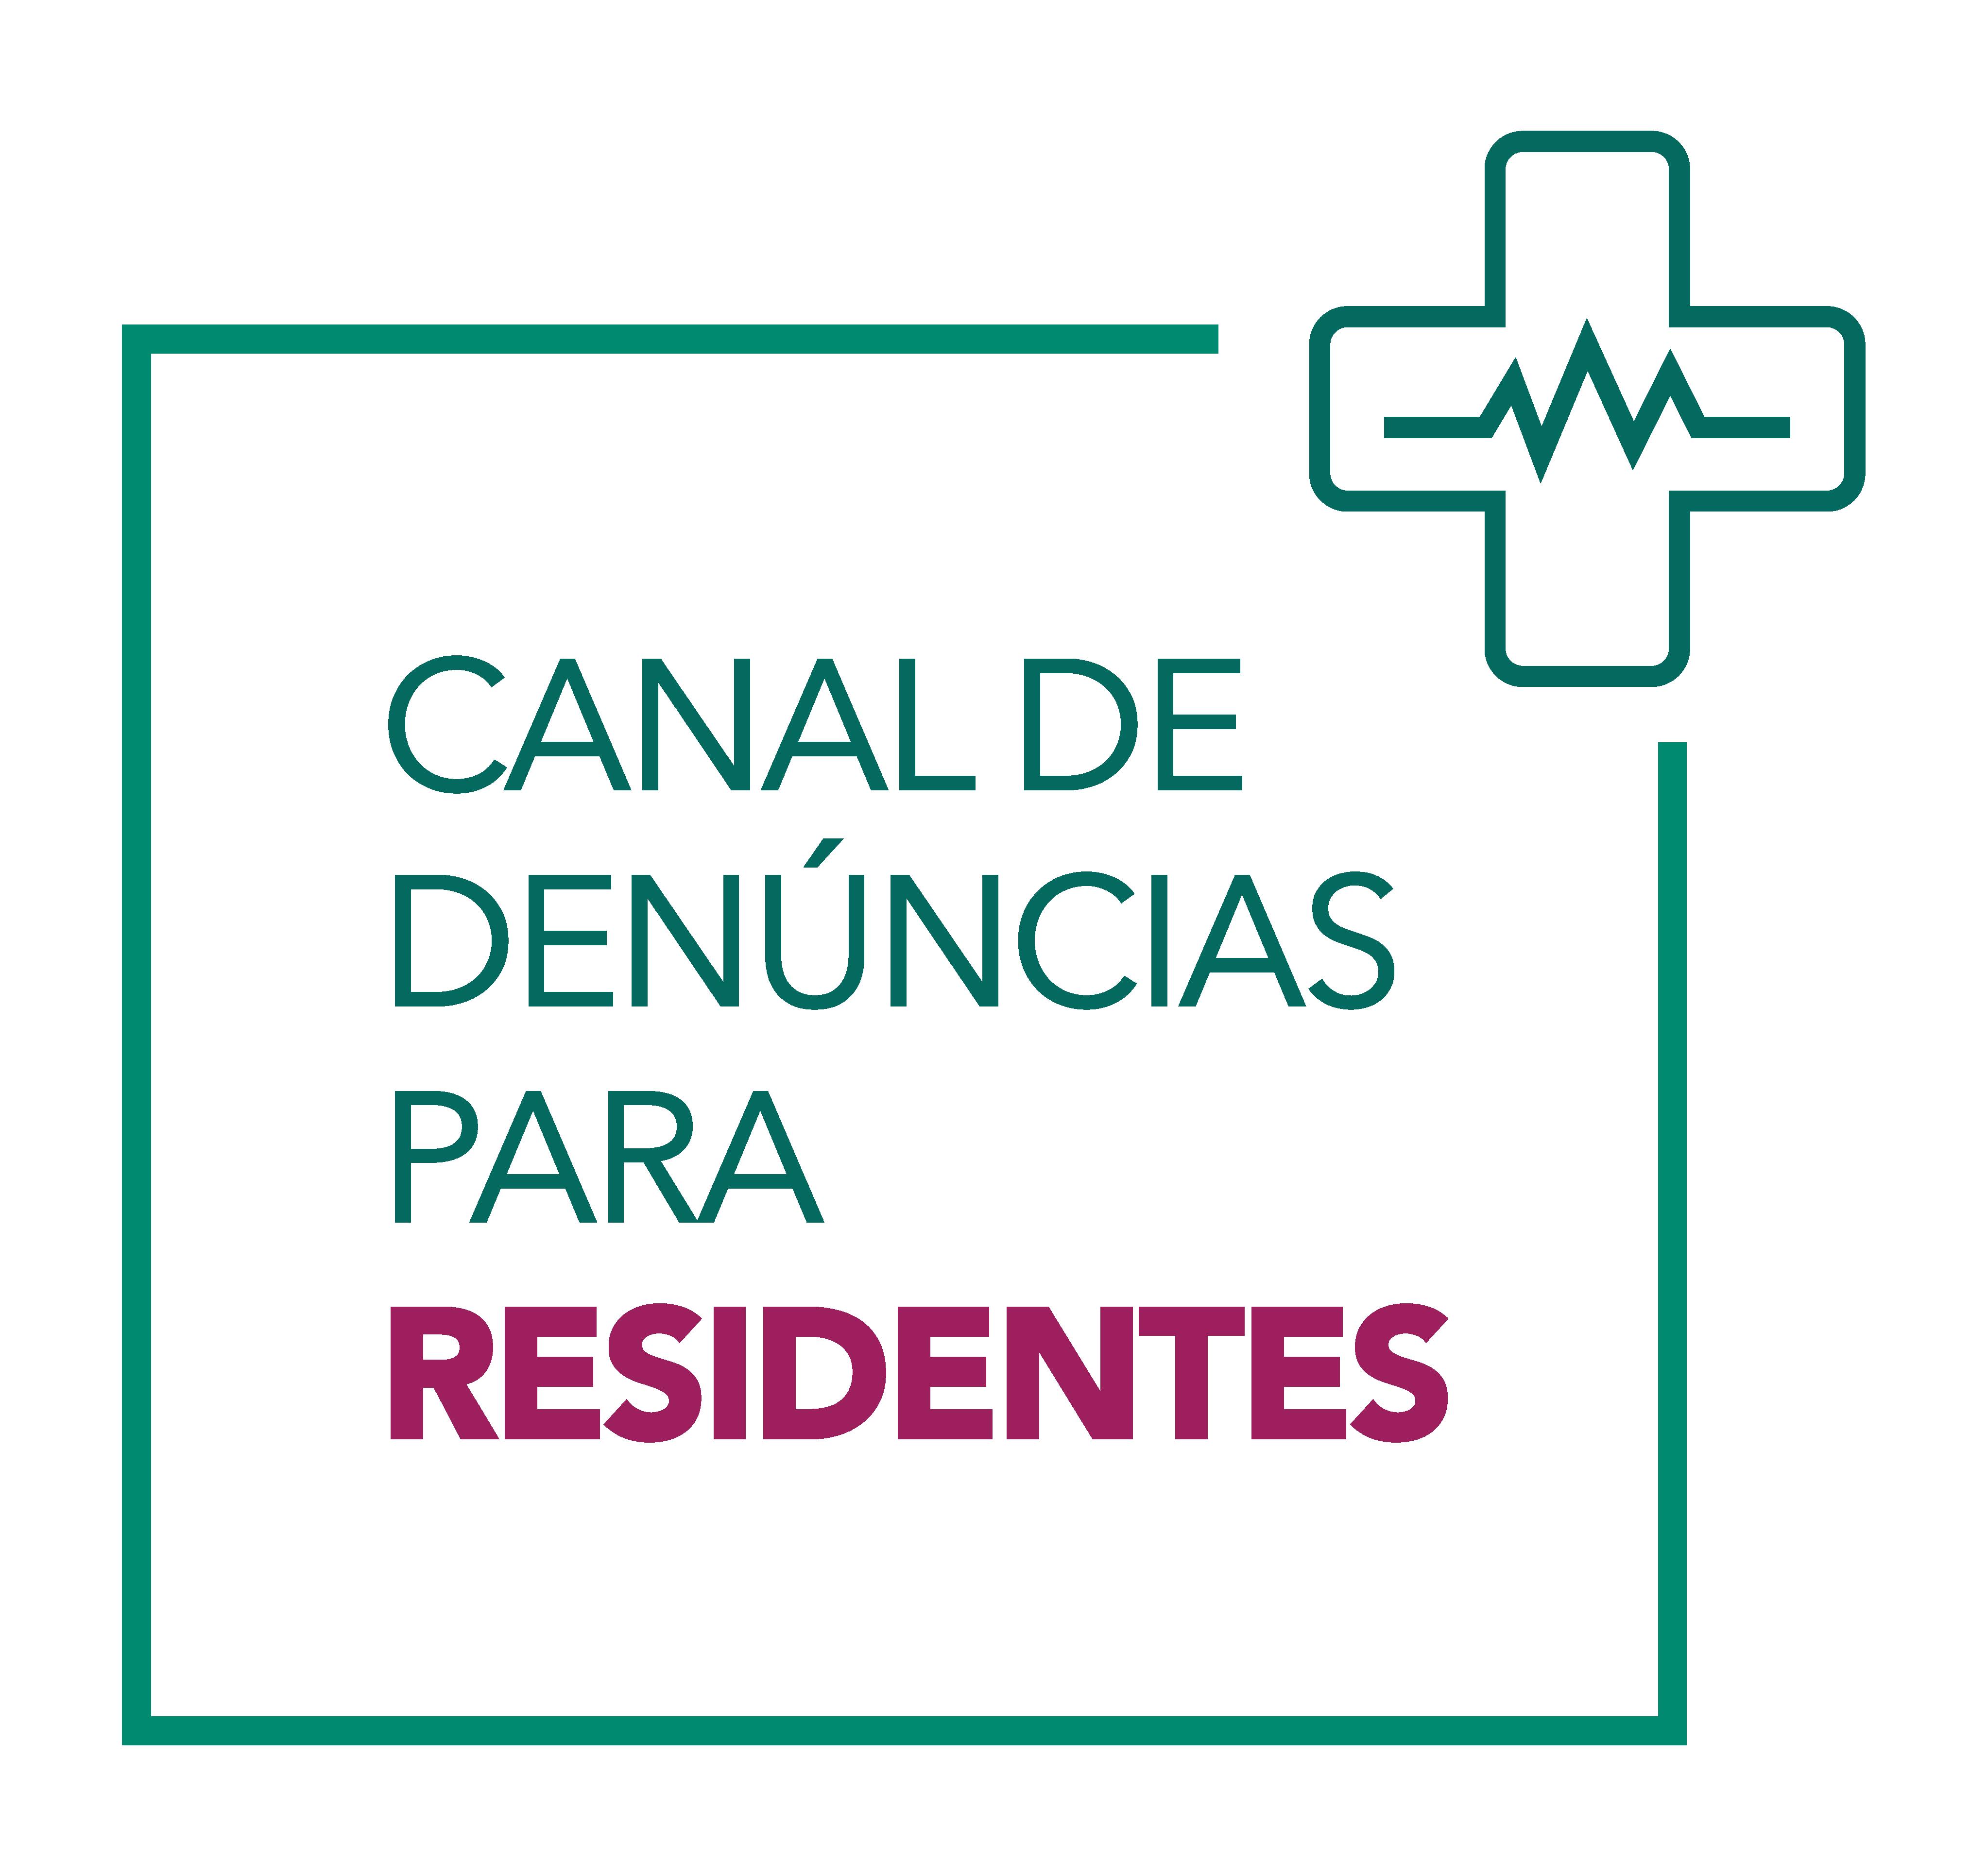 Canal de Denúncias para Residentes